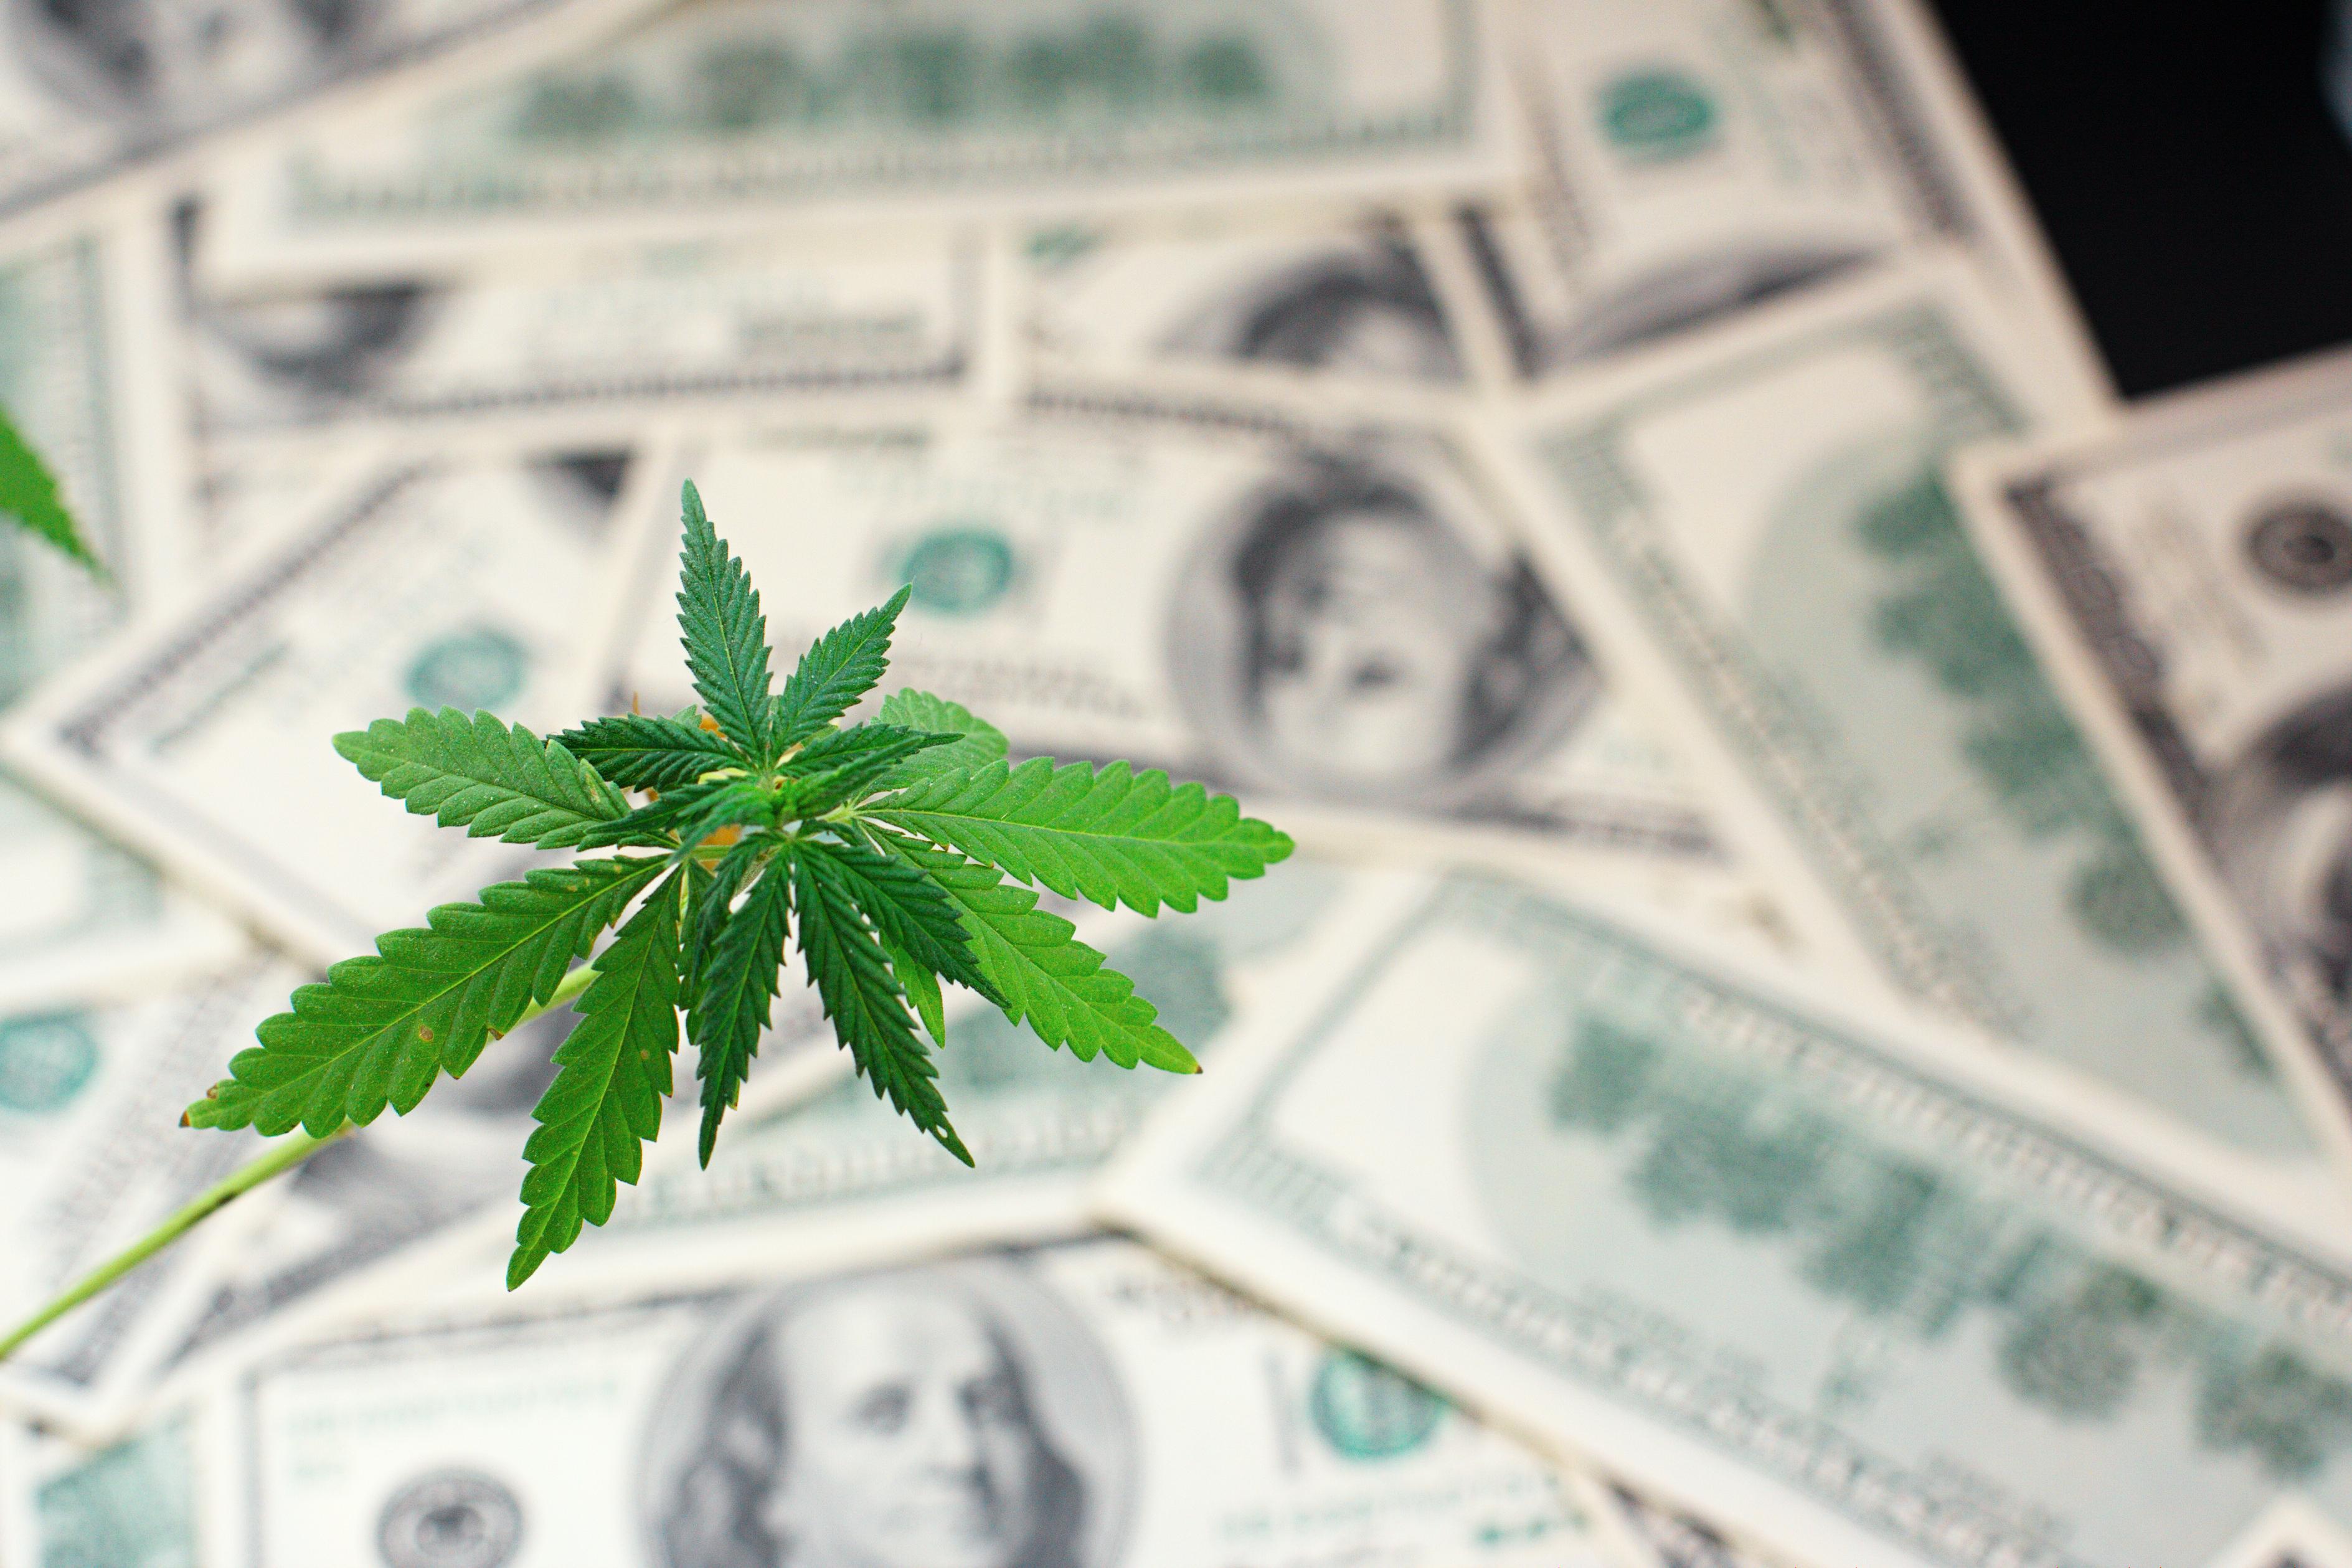 Marijuana leaf with $100 bills in background